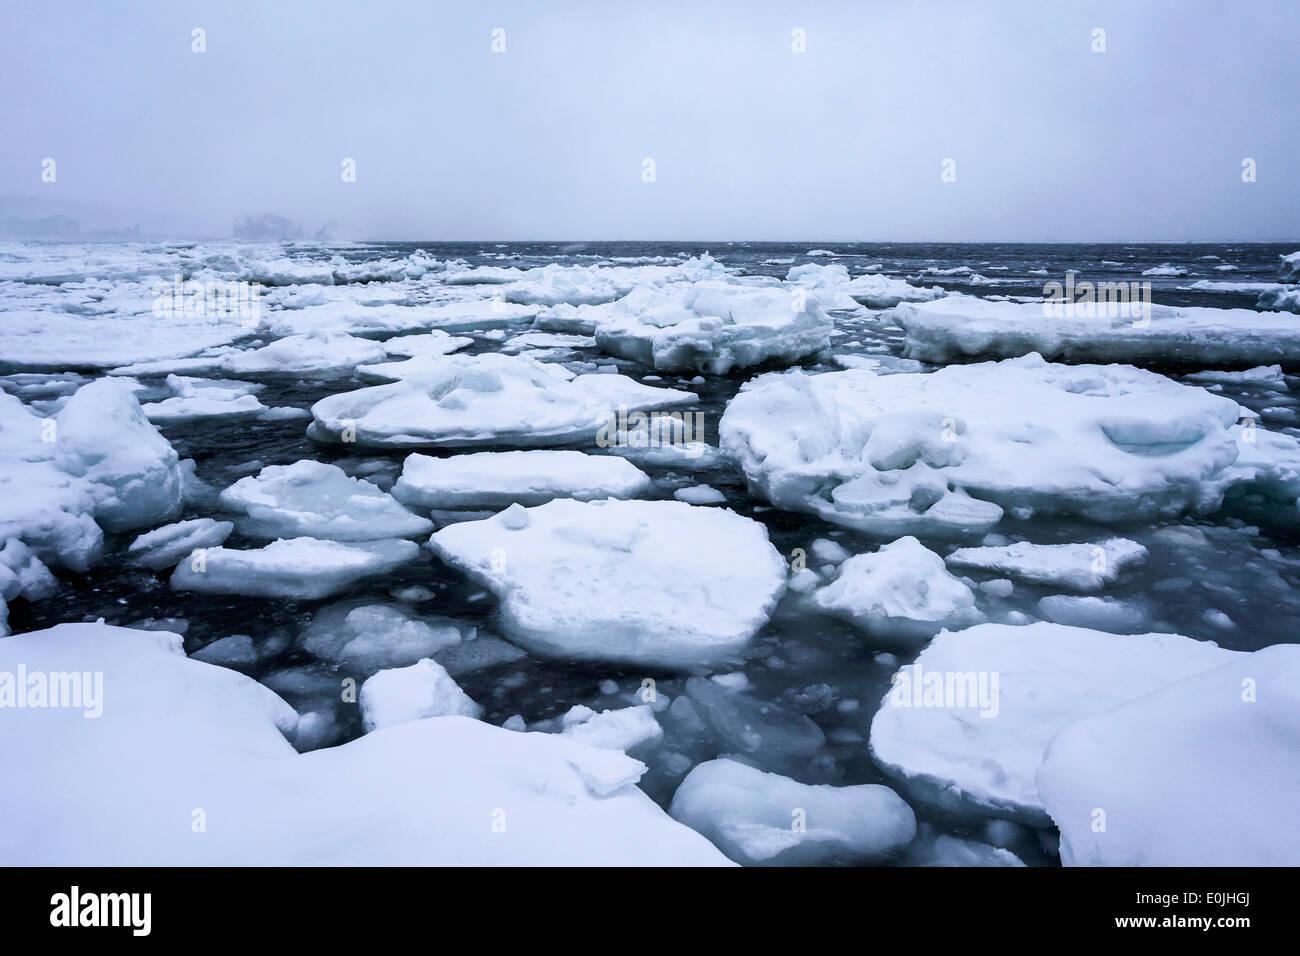 Draft ice on sea in Japan - Stock Image